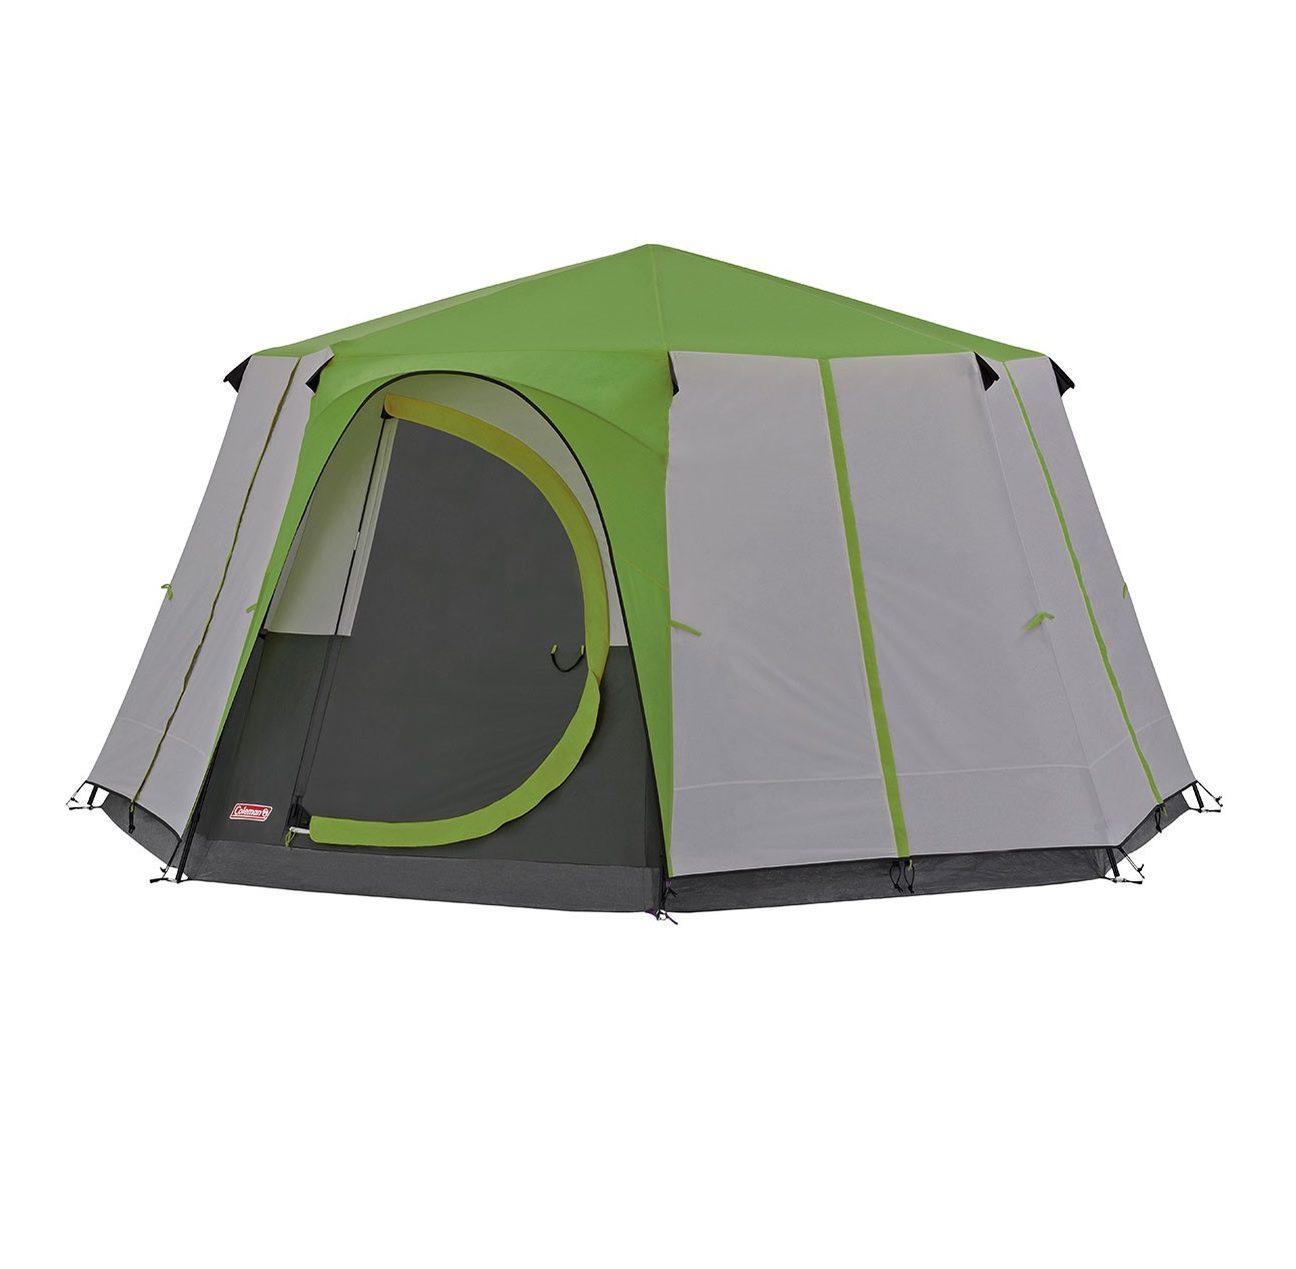 Coleman Octagon 8 tent green